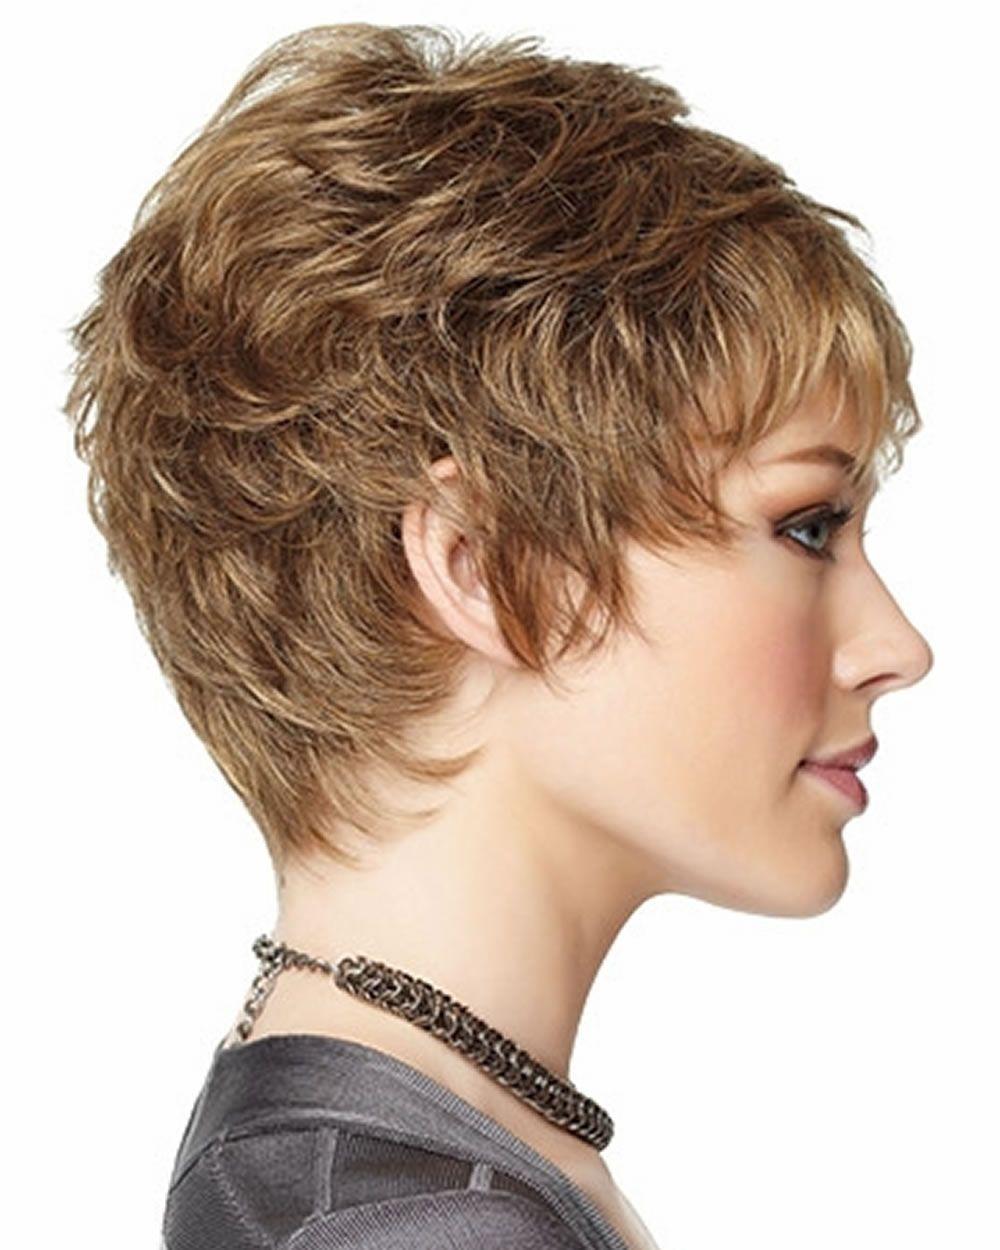 short curly hairstyles 2019 at DuckDuckGo | Short hair styles easy, Curly hair styles naturally ...